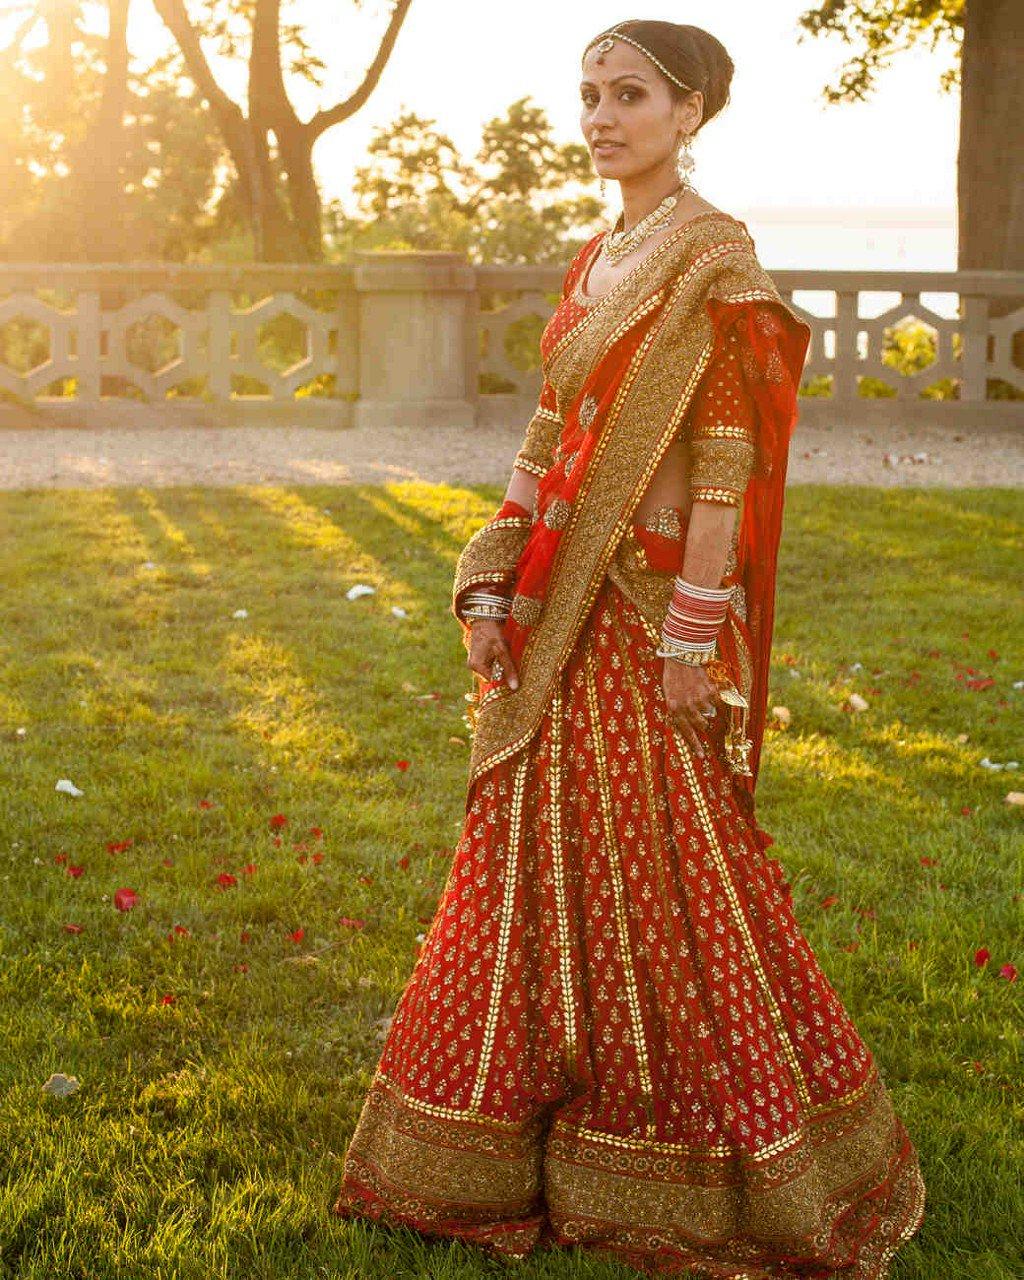 10 Common Indian Wedding Traditions https://t.co/ekAAyXouNp https://t.co/JxDLPwbmFU